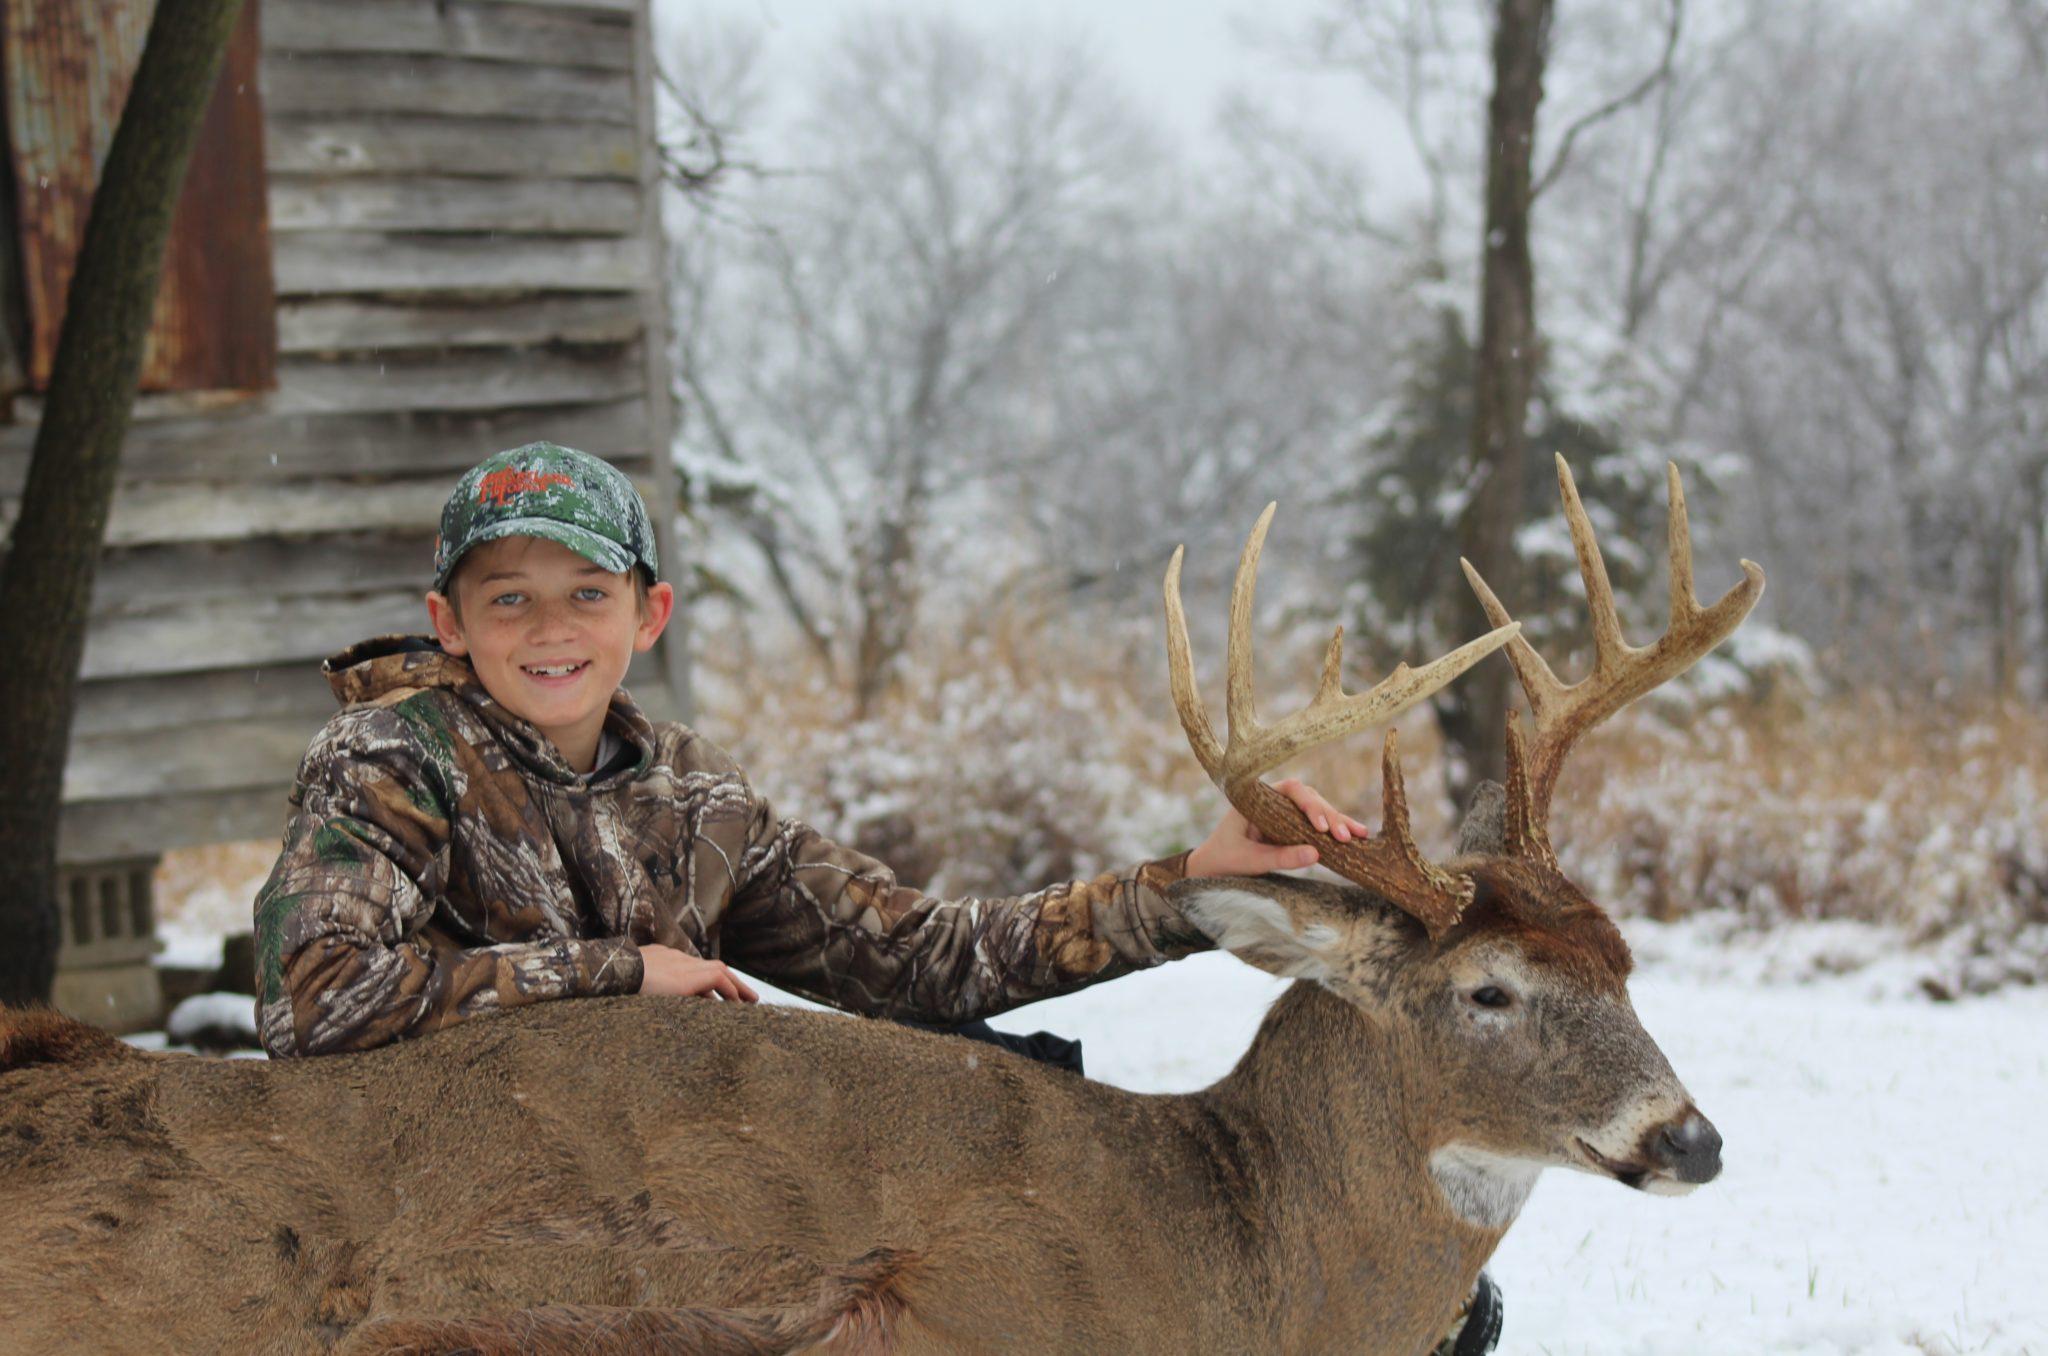 Late Season Whitetail Hunting: Illinois Late Deer Hunts in 2021 Il Deer Rut